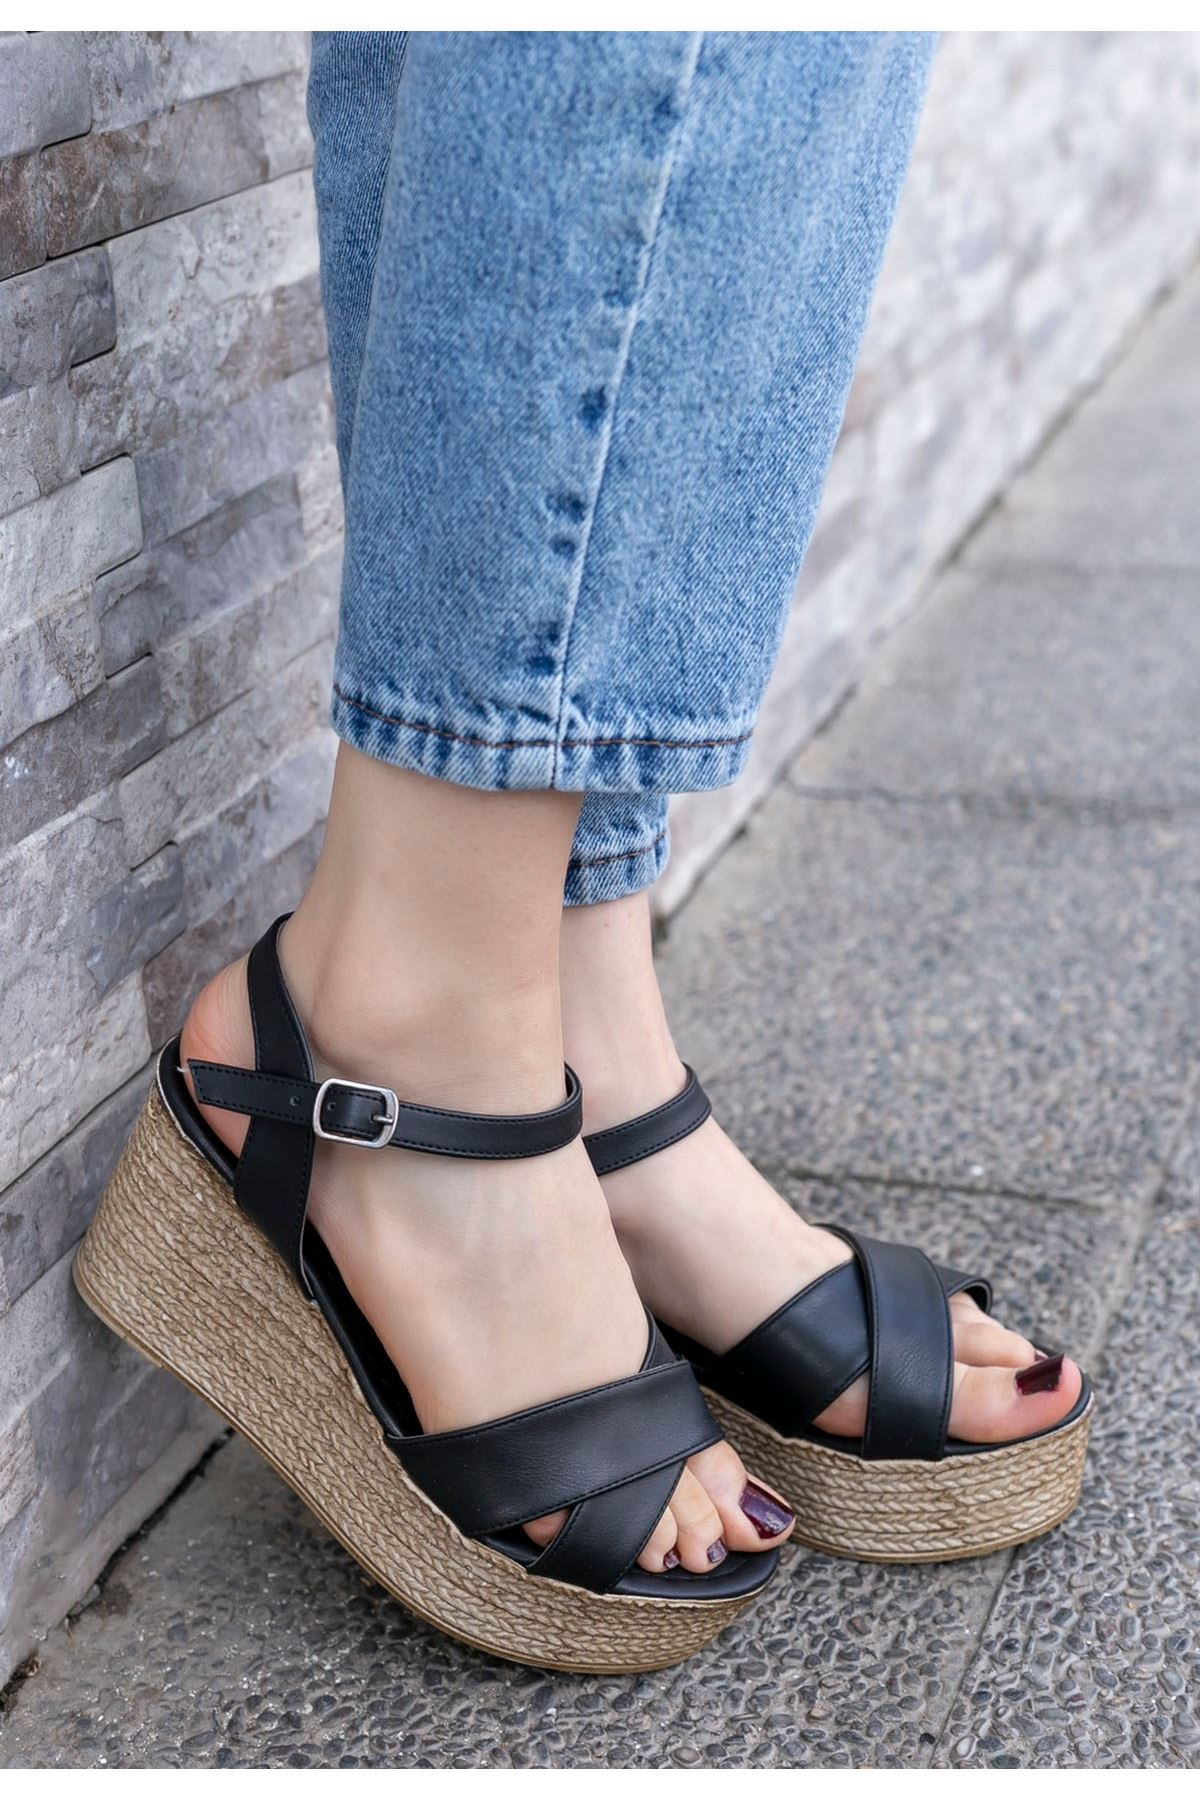 Açela Siyah Cilt Dolgu Topuk Sandalet